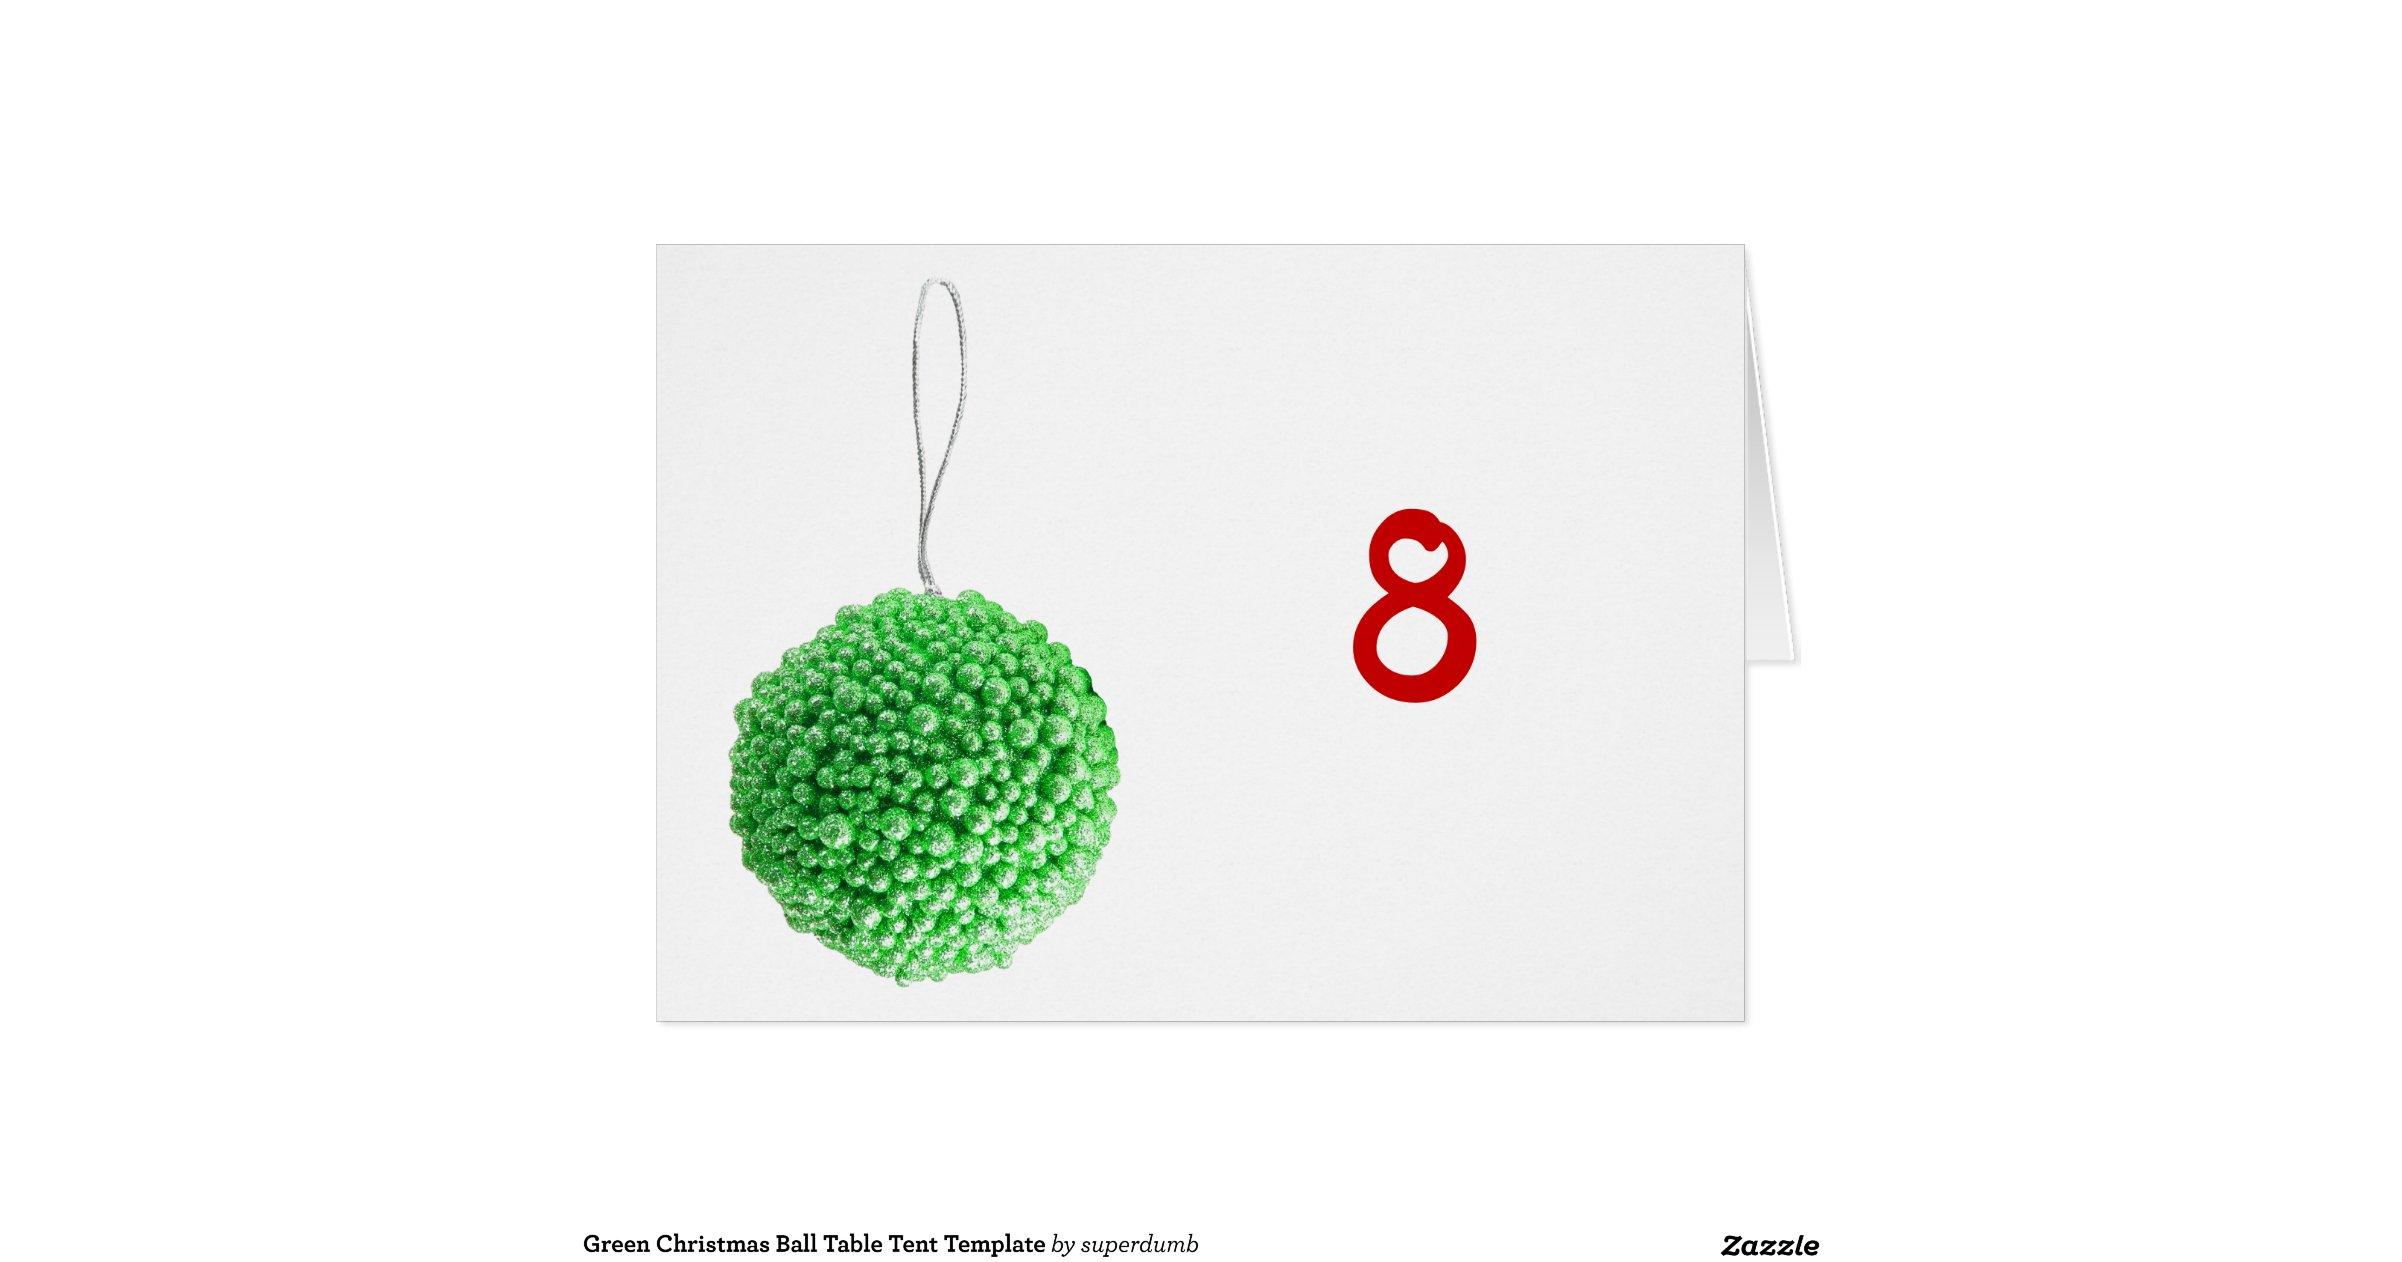 green_christmas_ball_table_tent_template_card ...